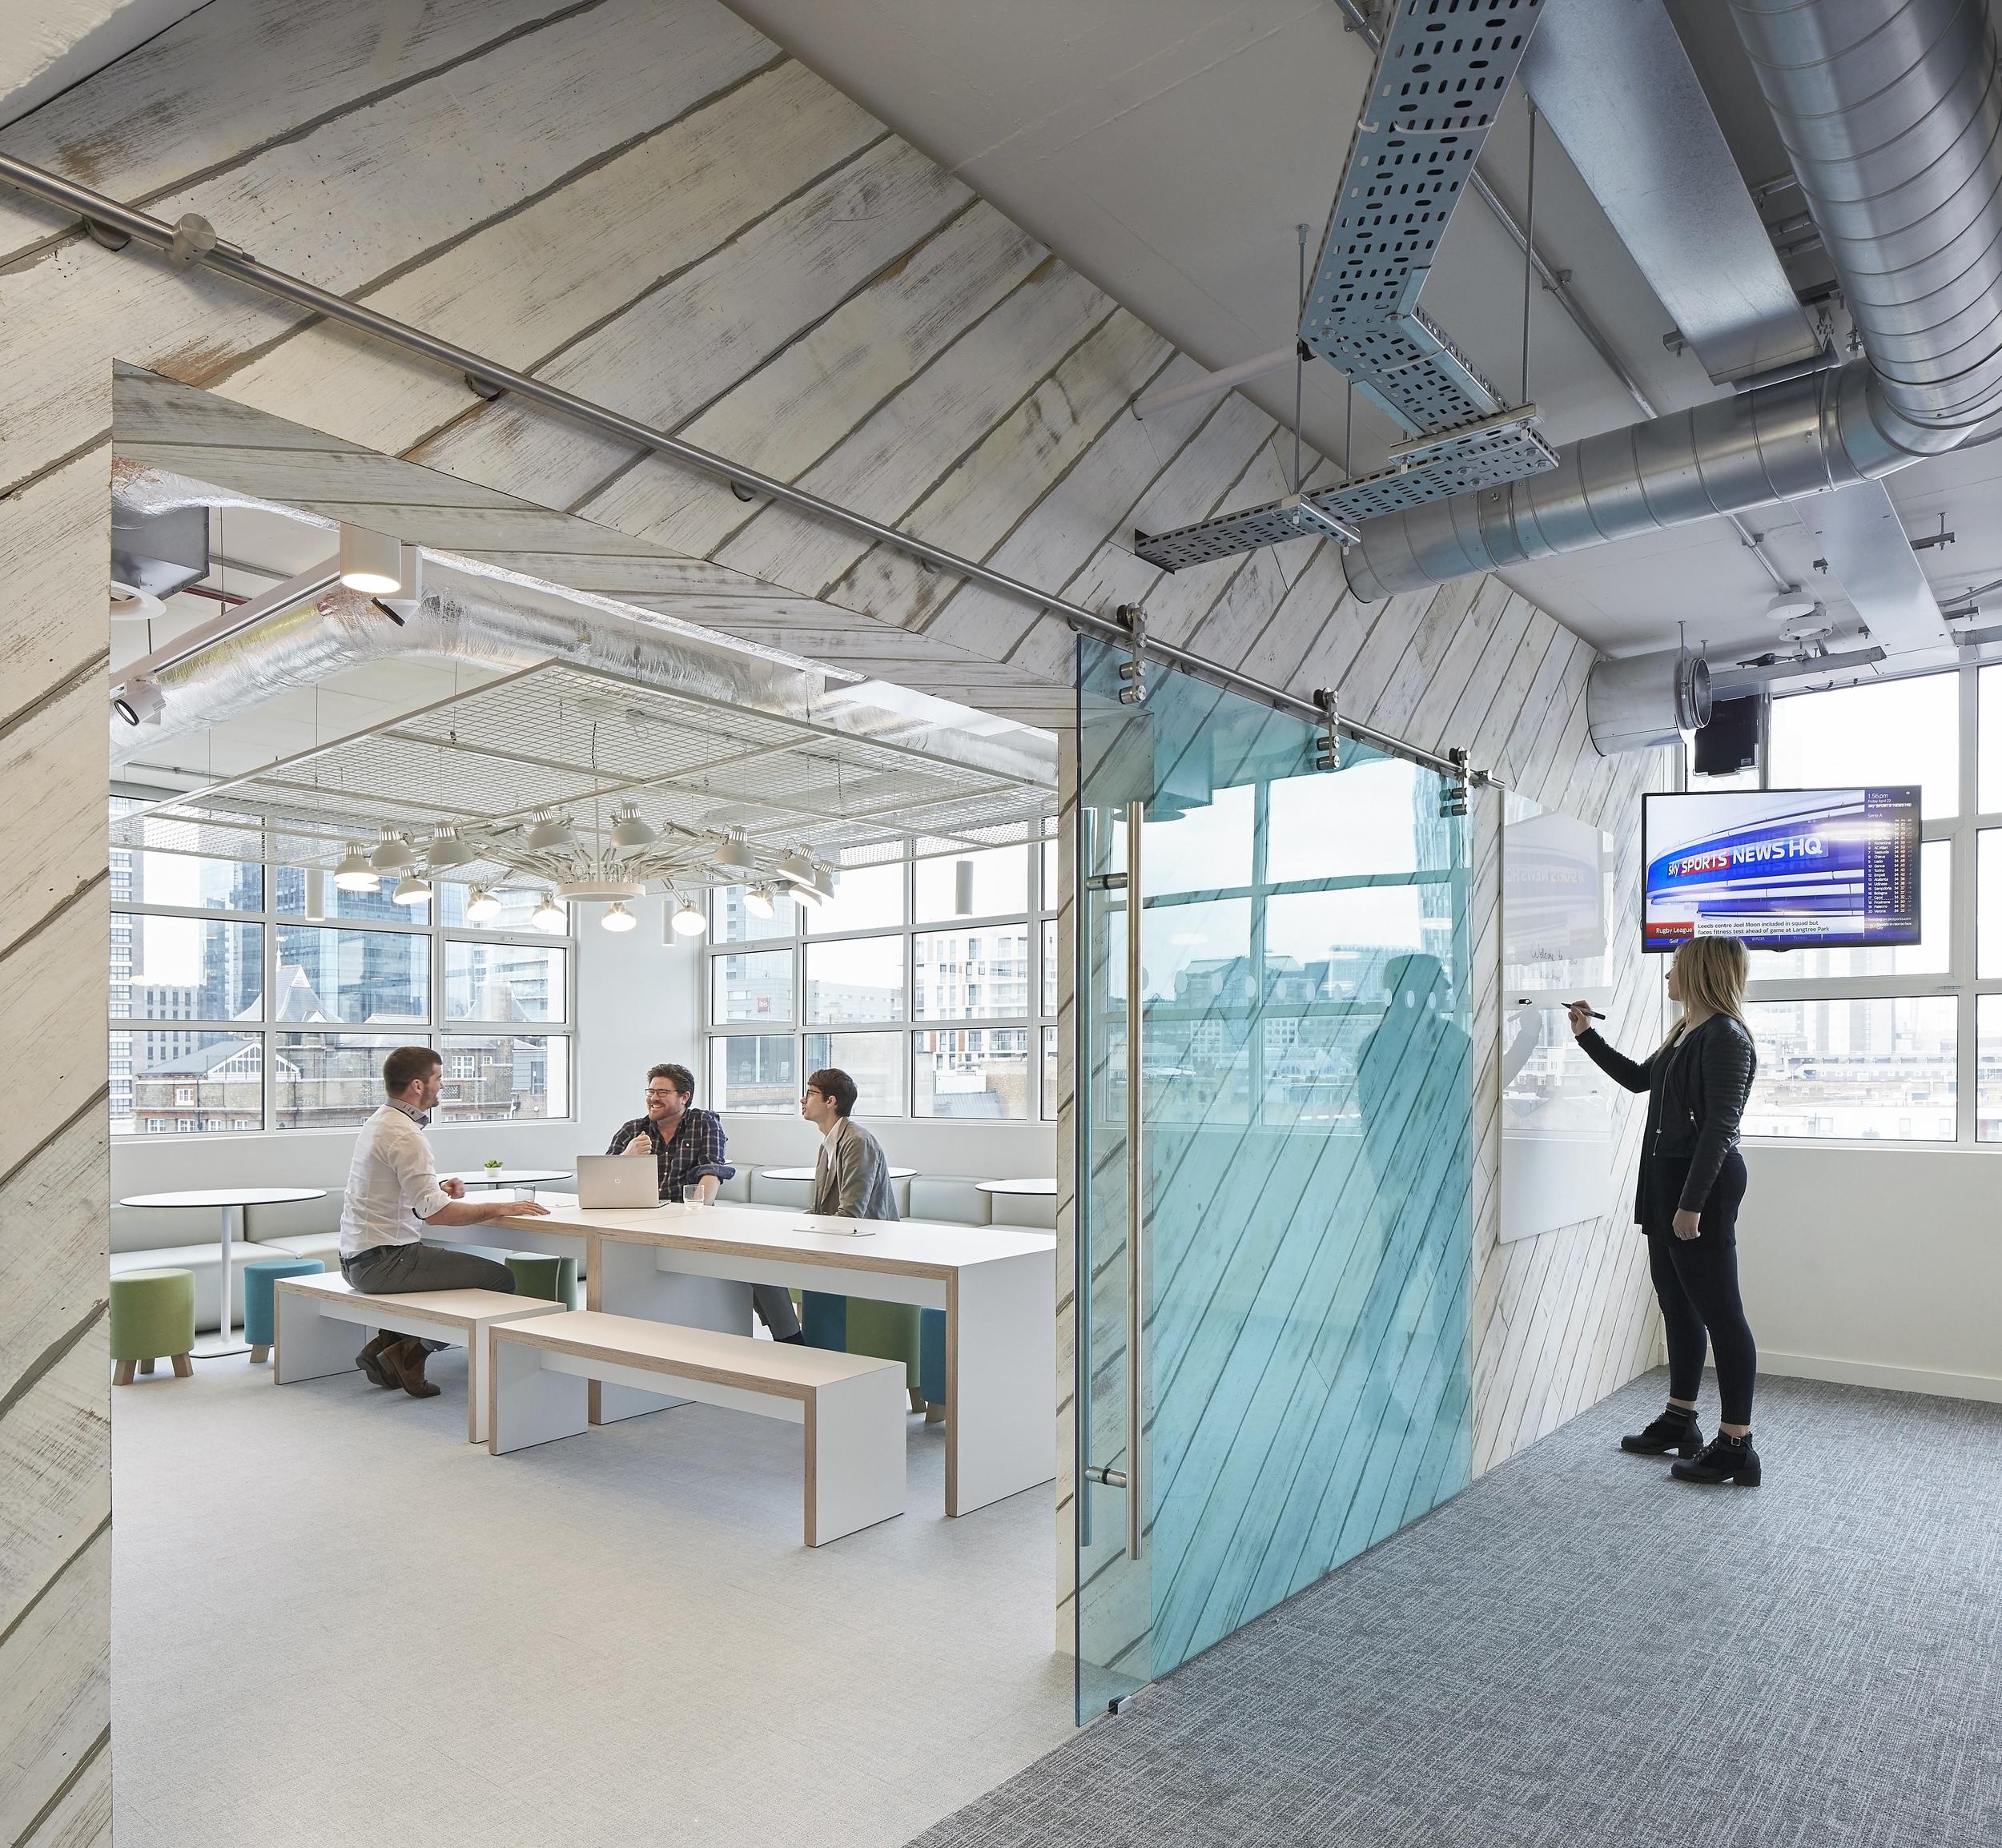 HLW_SKY offices_Brick Lane_-®Hufton+Crow_004.jpg